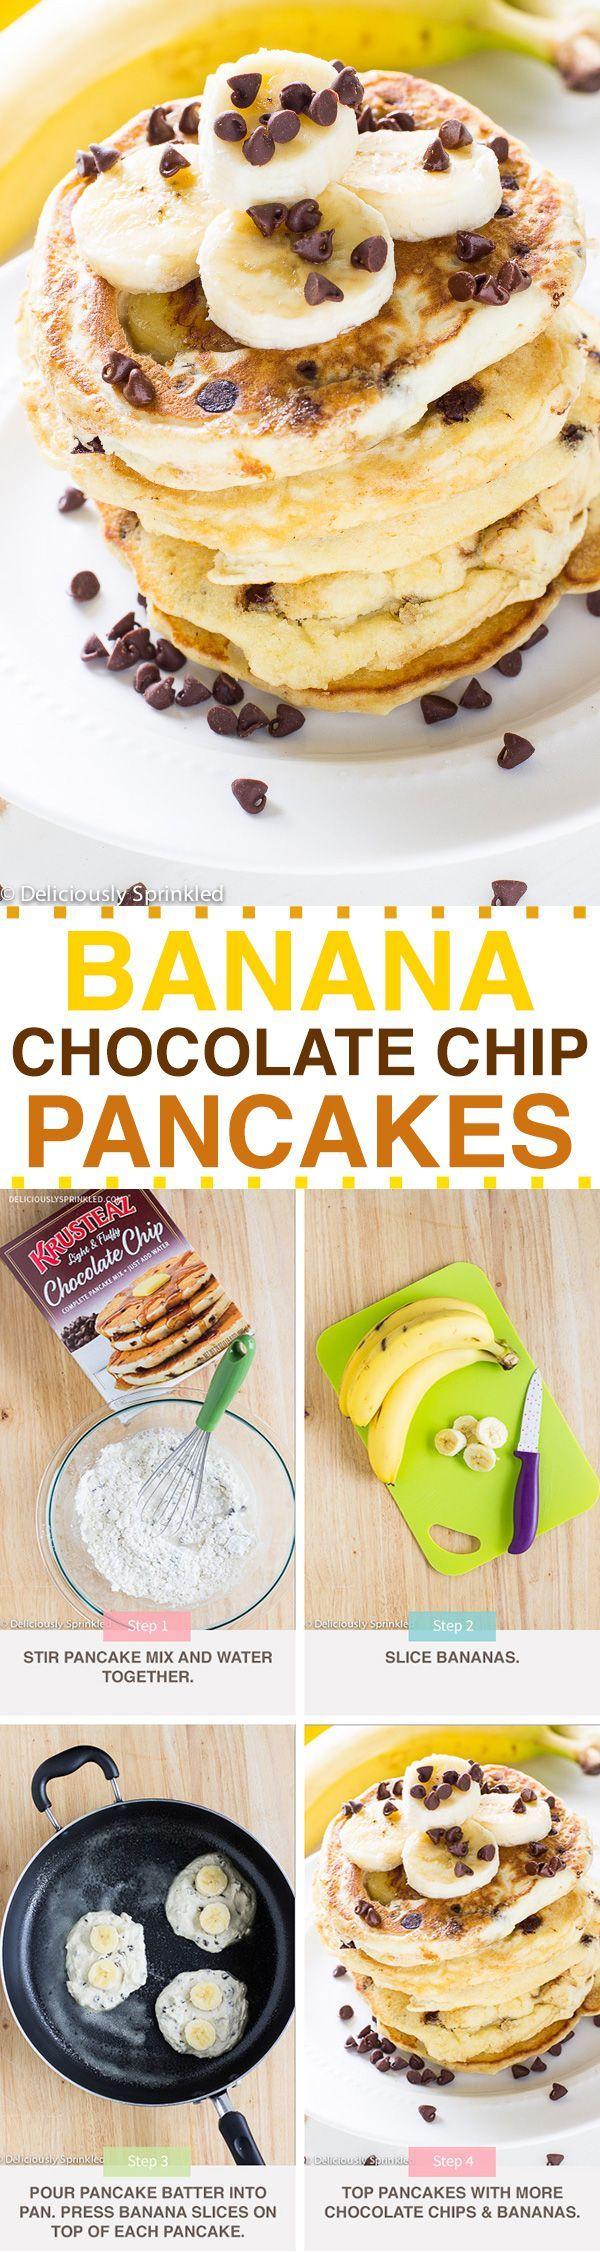 Banana Chocolate Chip Pancakes made with Krusteaz Chocolate Chip ...